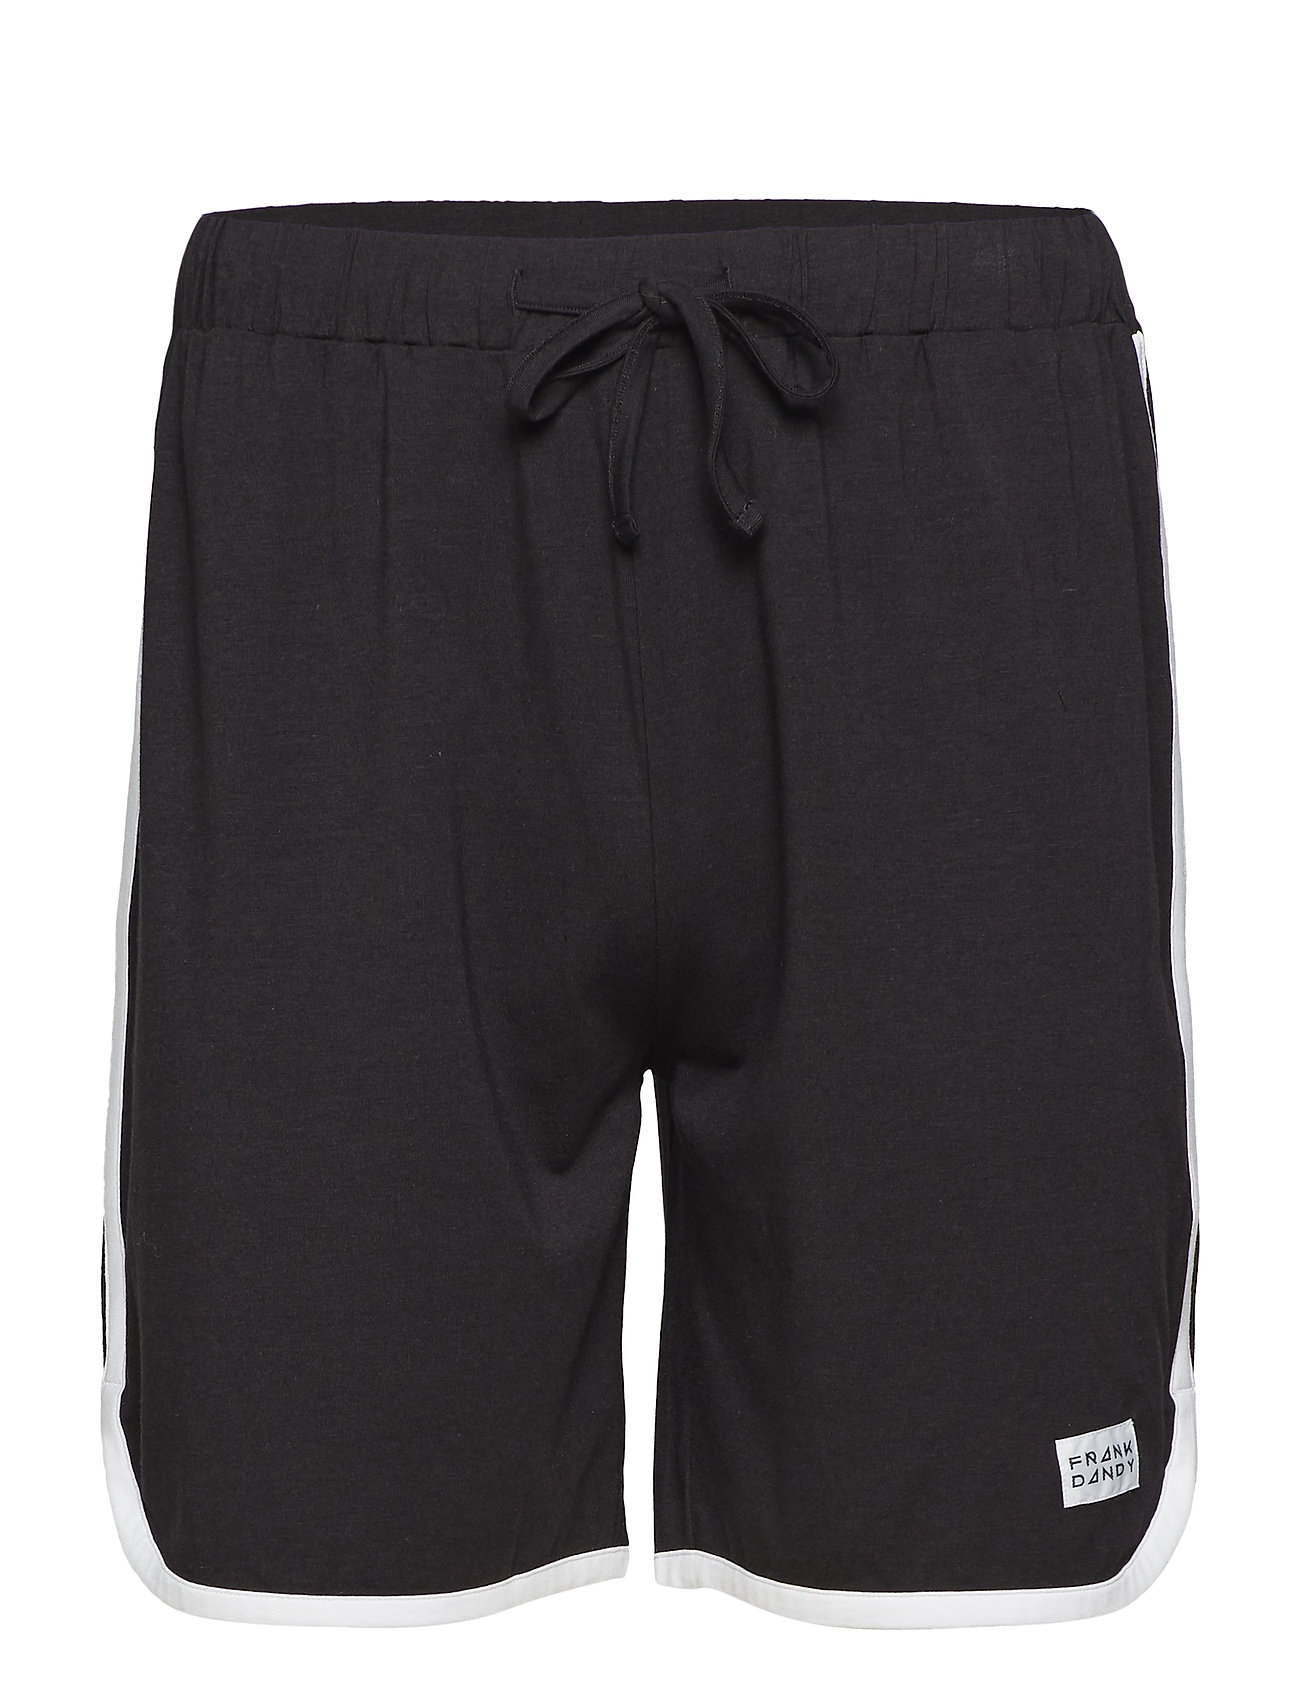 Frank Dandy St Paul Bamboo Contrast shorts Shorts